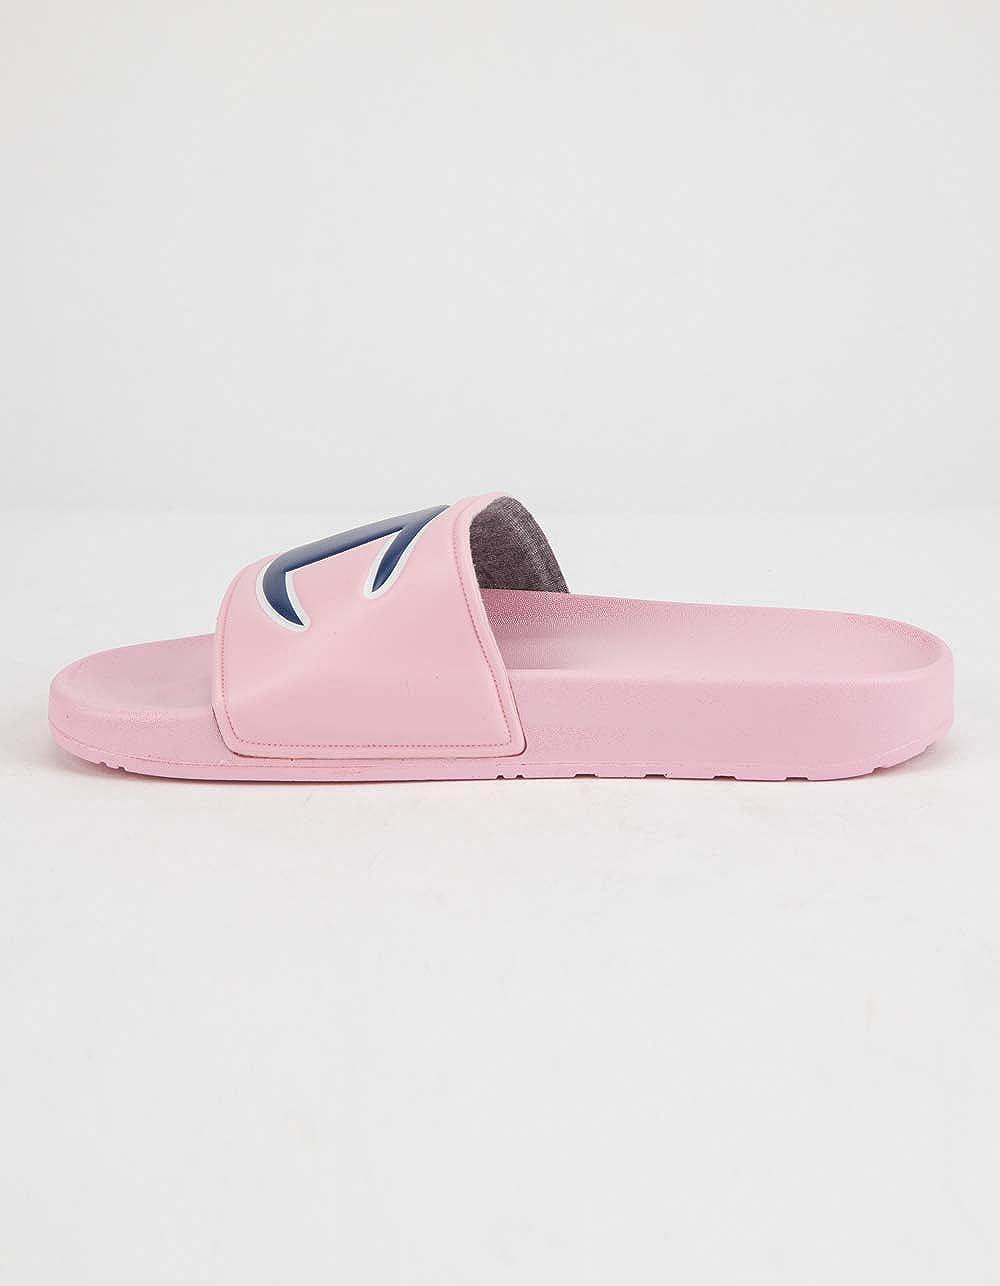 5 M US Big Kid, Pink//Pink 33942638003 Champion Life Youth Kids Unisex Slide Sandals